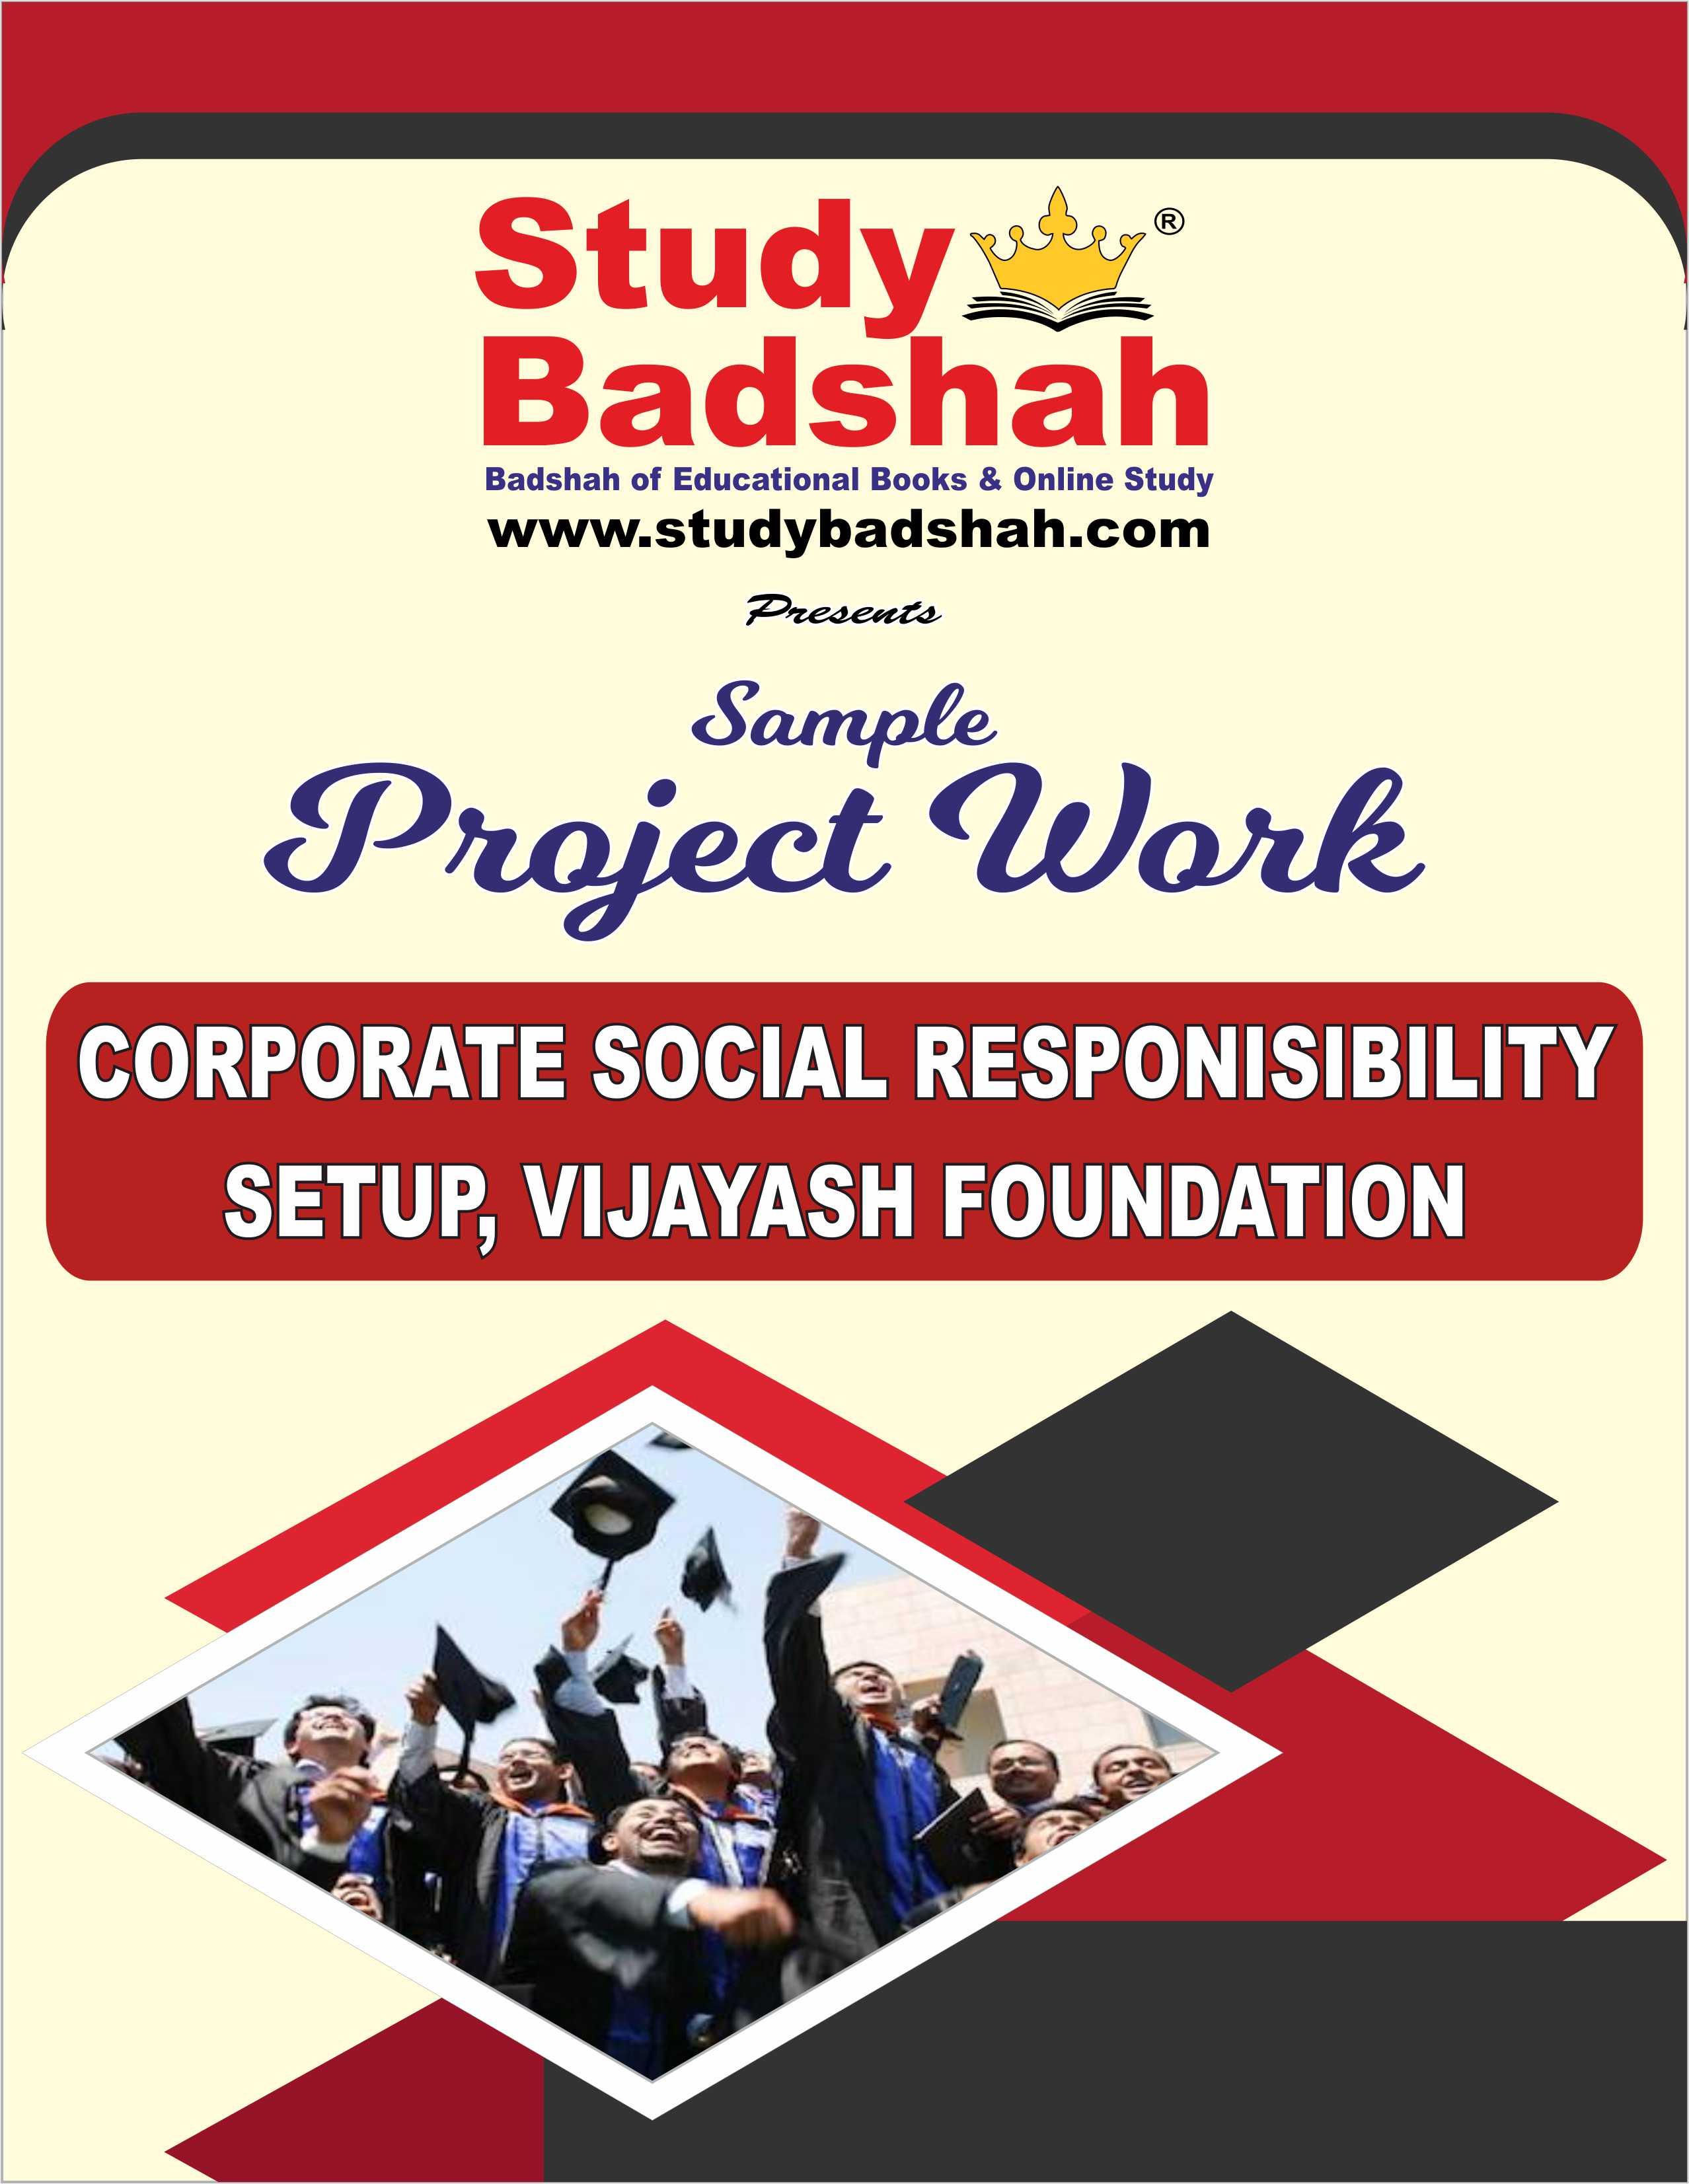 CORPORATE SOCIAL RESPONSIBILITY SETUP, VIJAYASH FOUNDATION